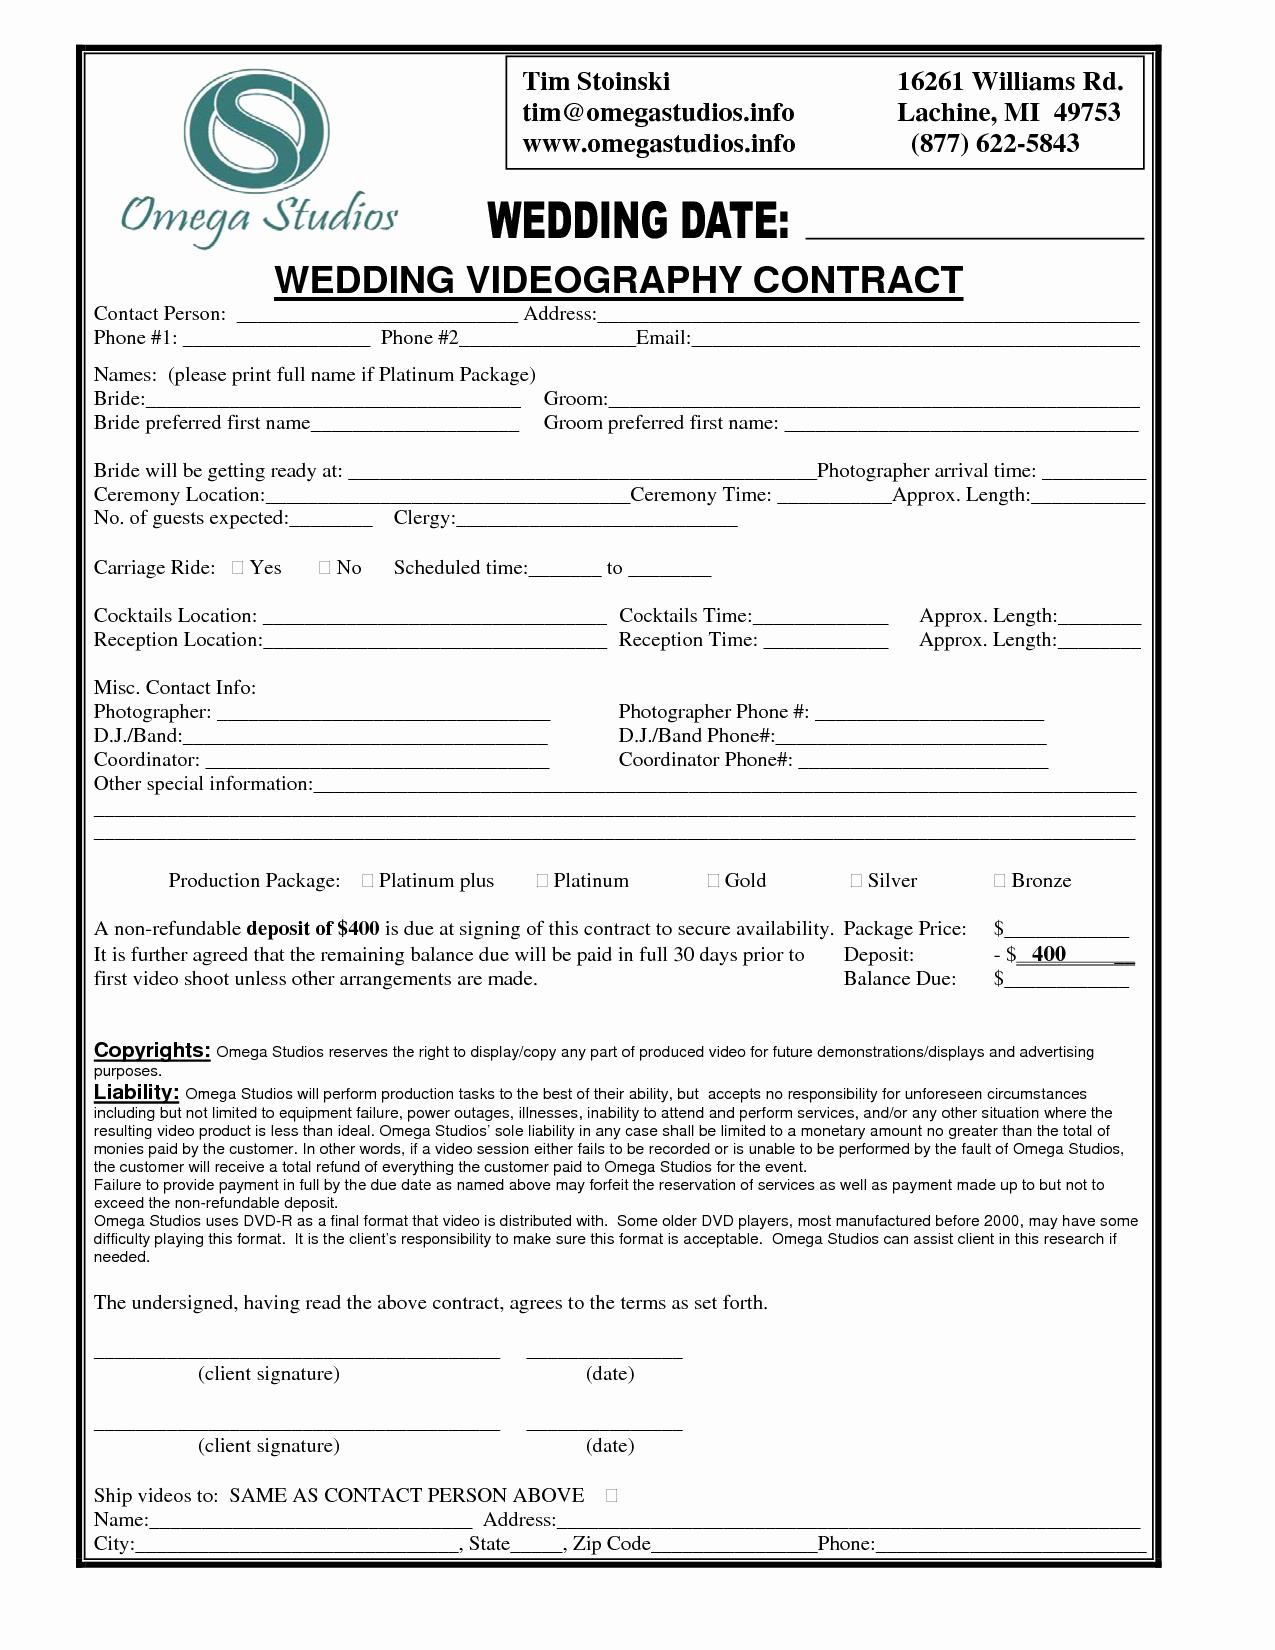 Wedding Videographer Contract Template Luxury Videographer Contract Template Free Printable Documents